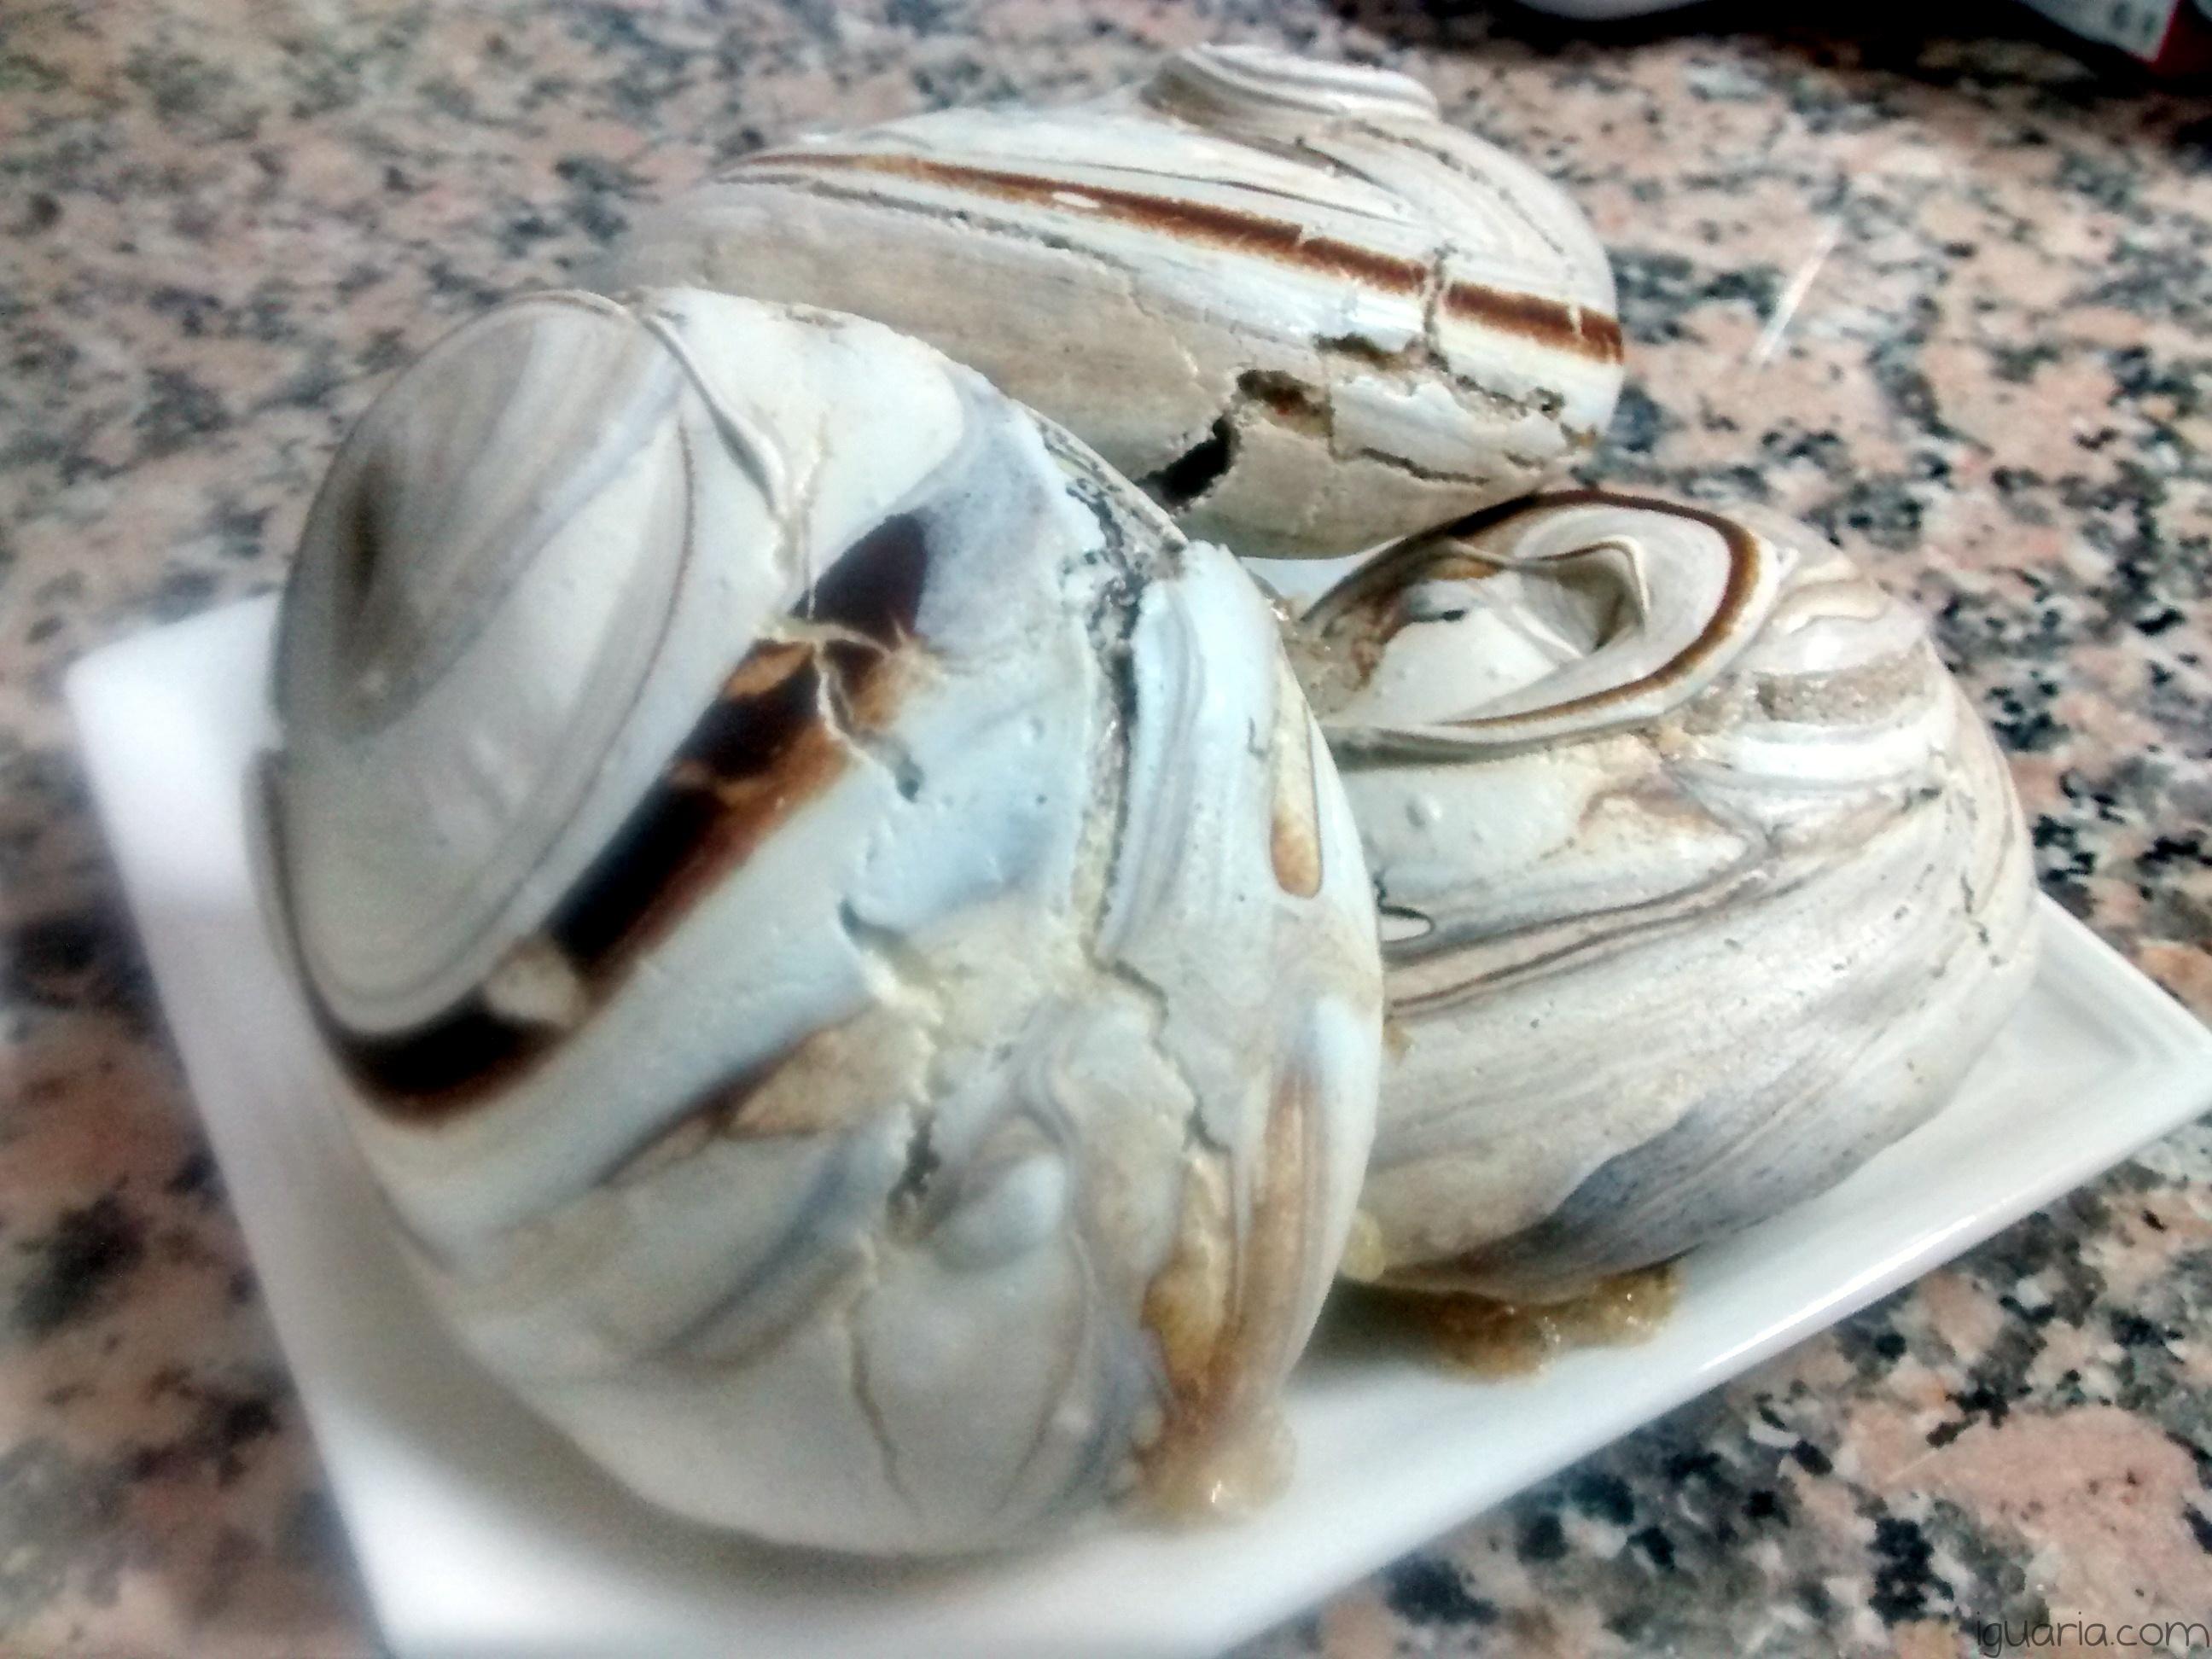 iguaria-suspiros-de-chocolate